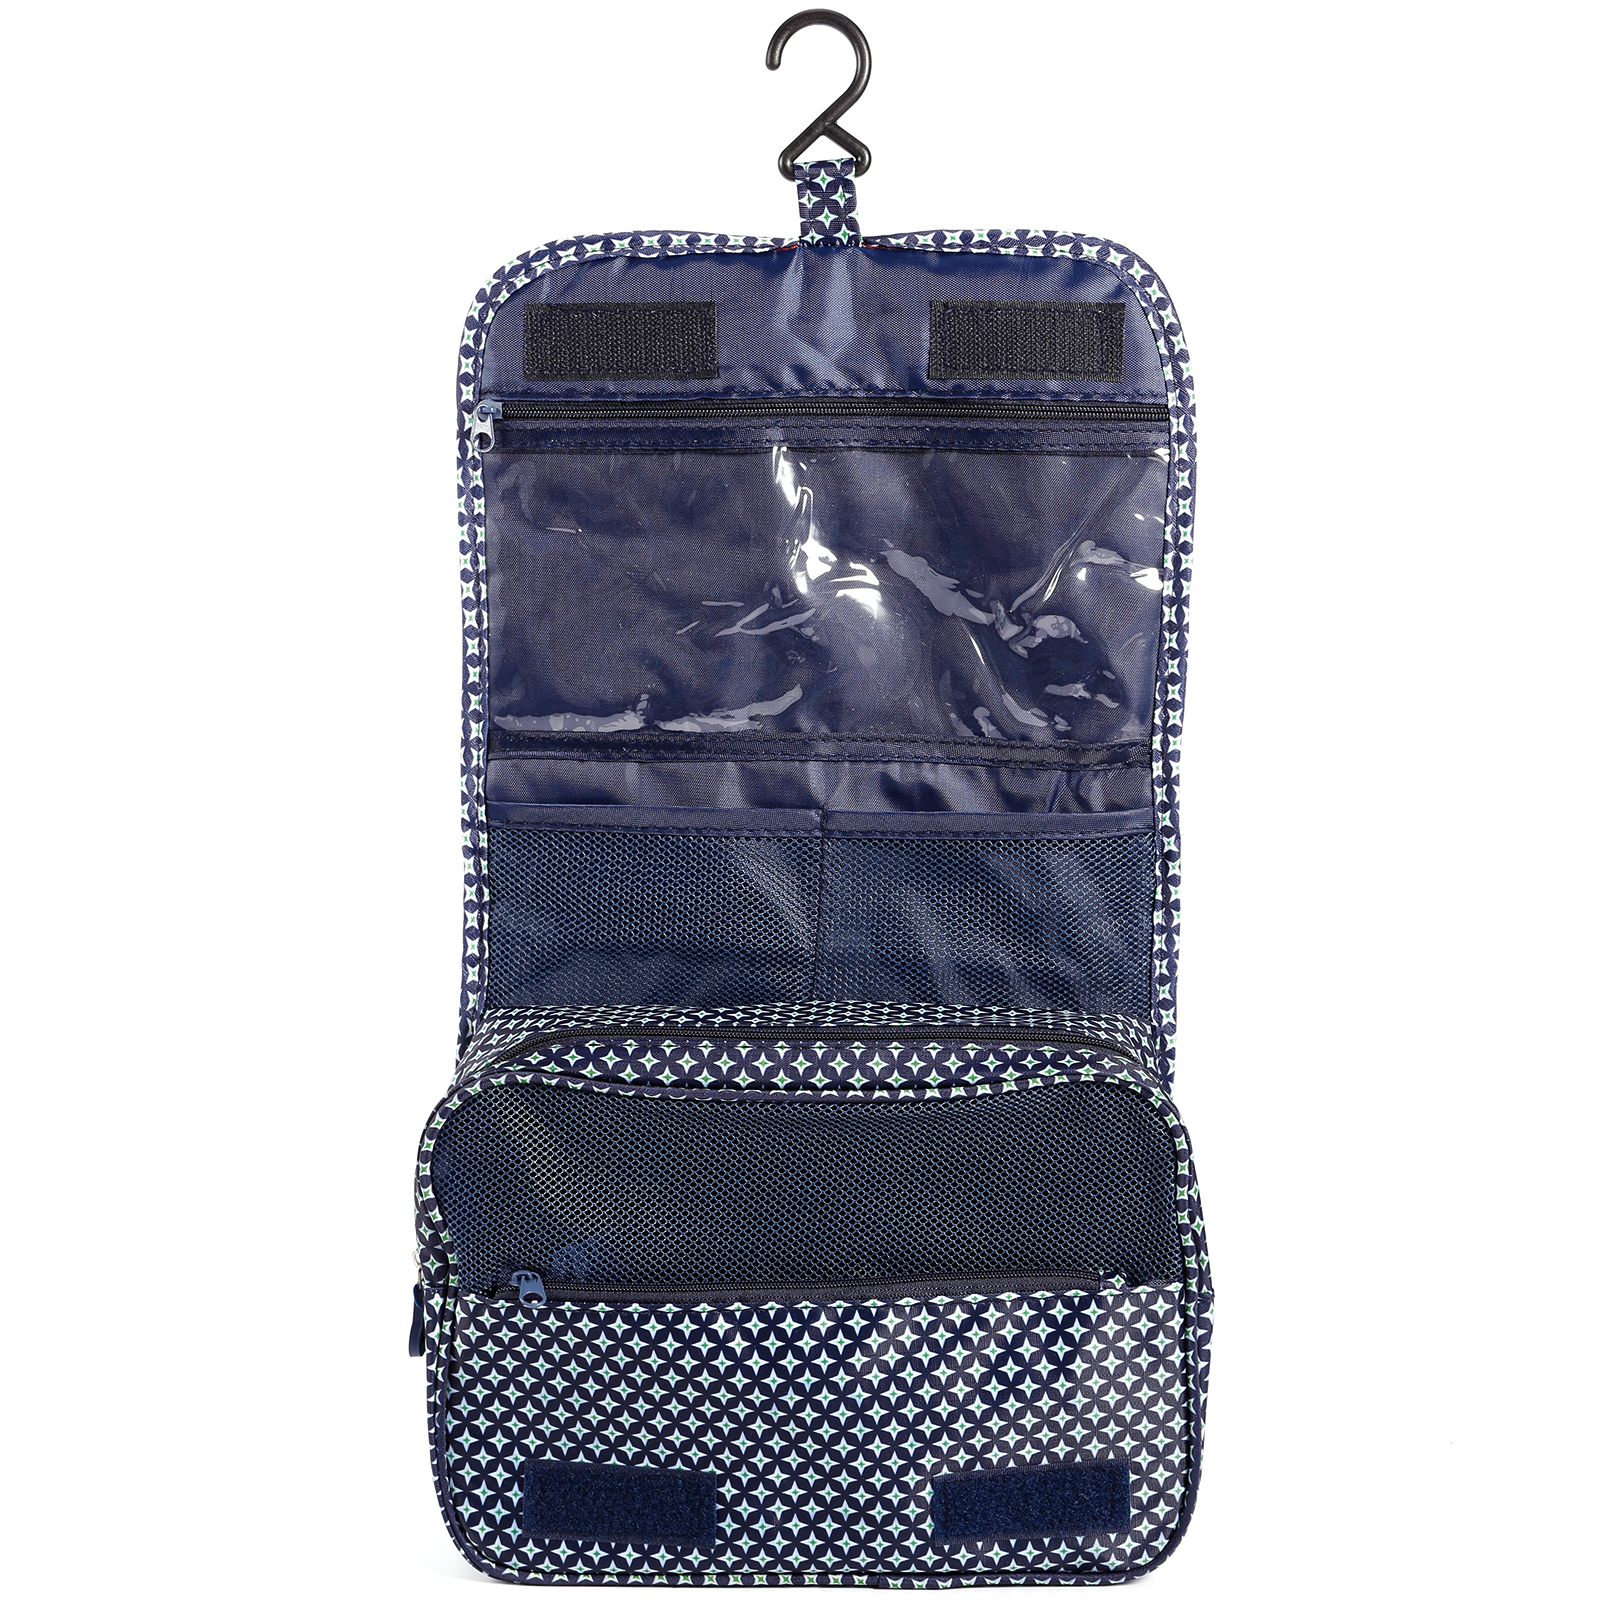 Hanging Bag Polyester Travel Organizer Cosmetic Bag